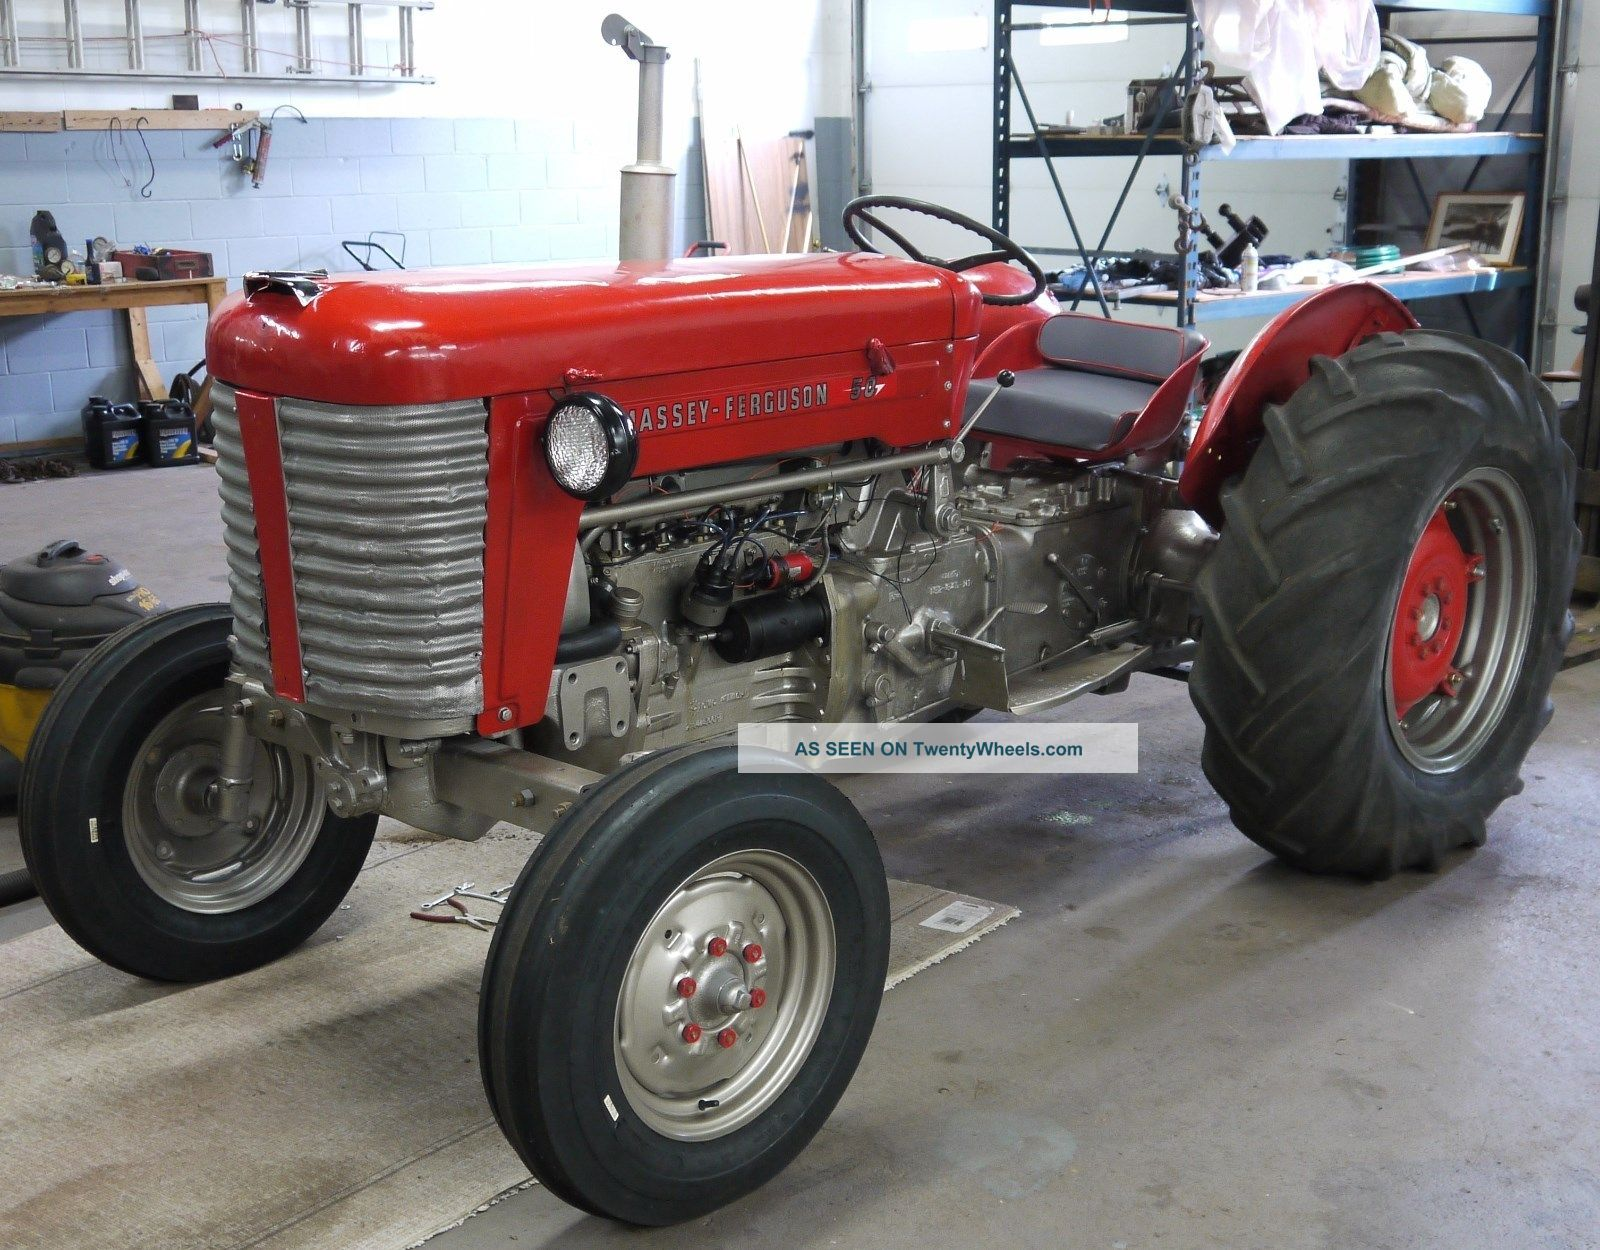 1956 Tractor - Massey Ferguson 50 Tractors photo